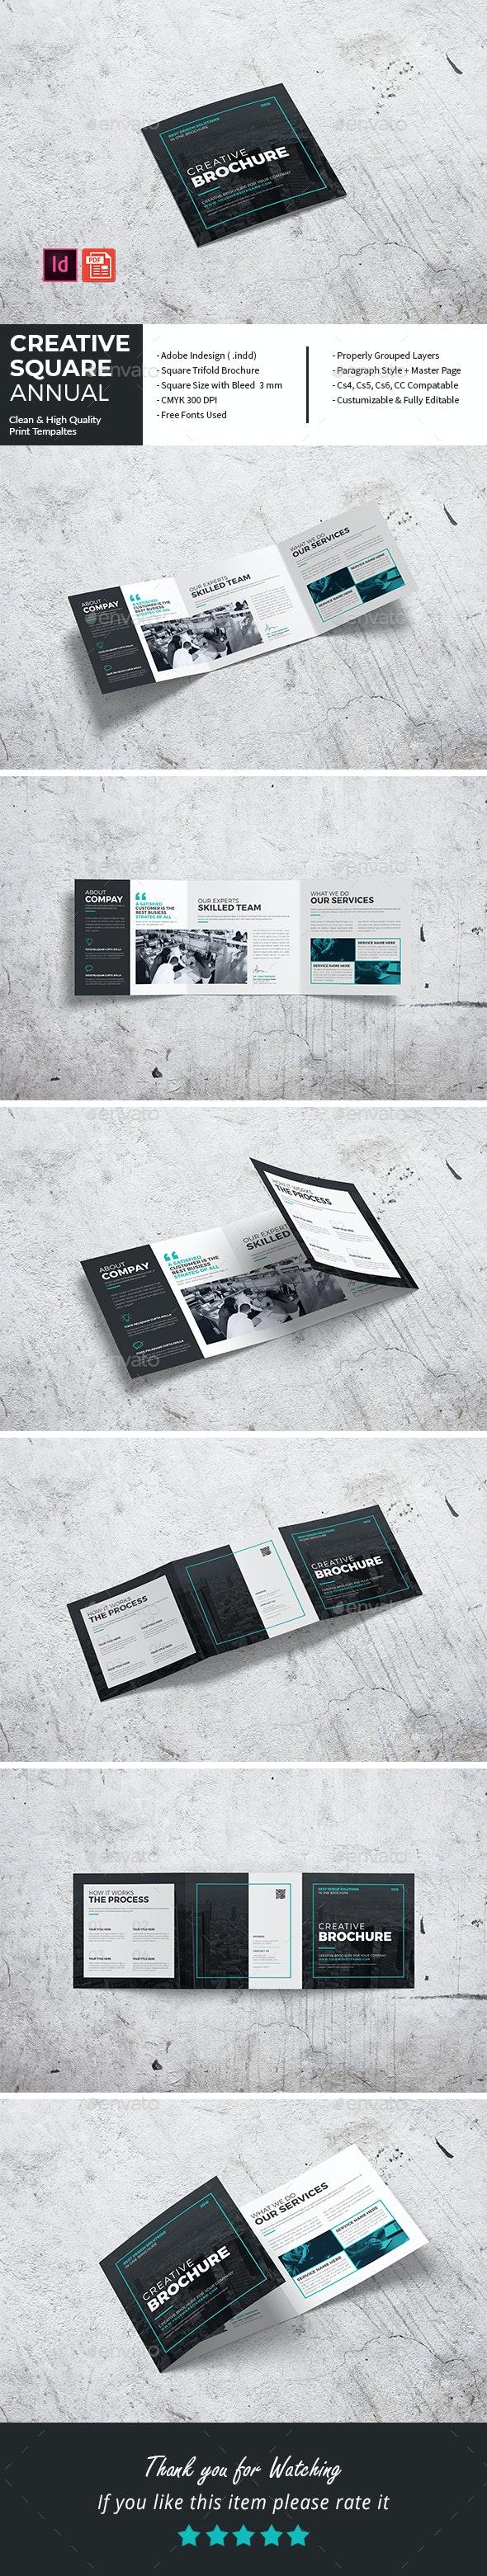 Creative Square Annual Tri-Fold - Corporate Brochures